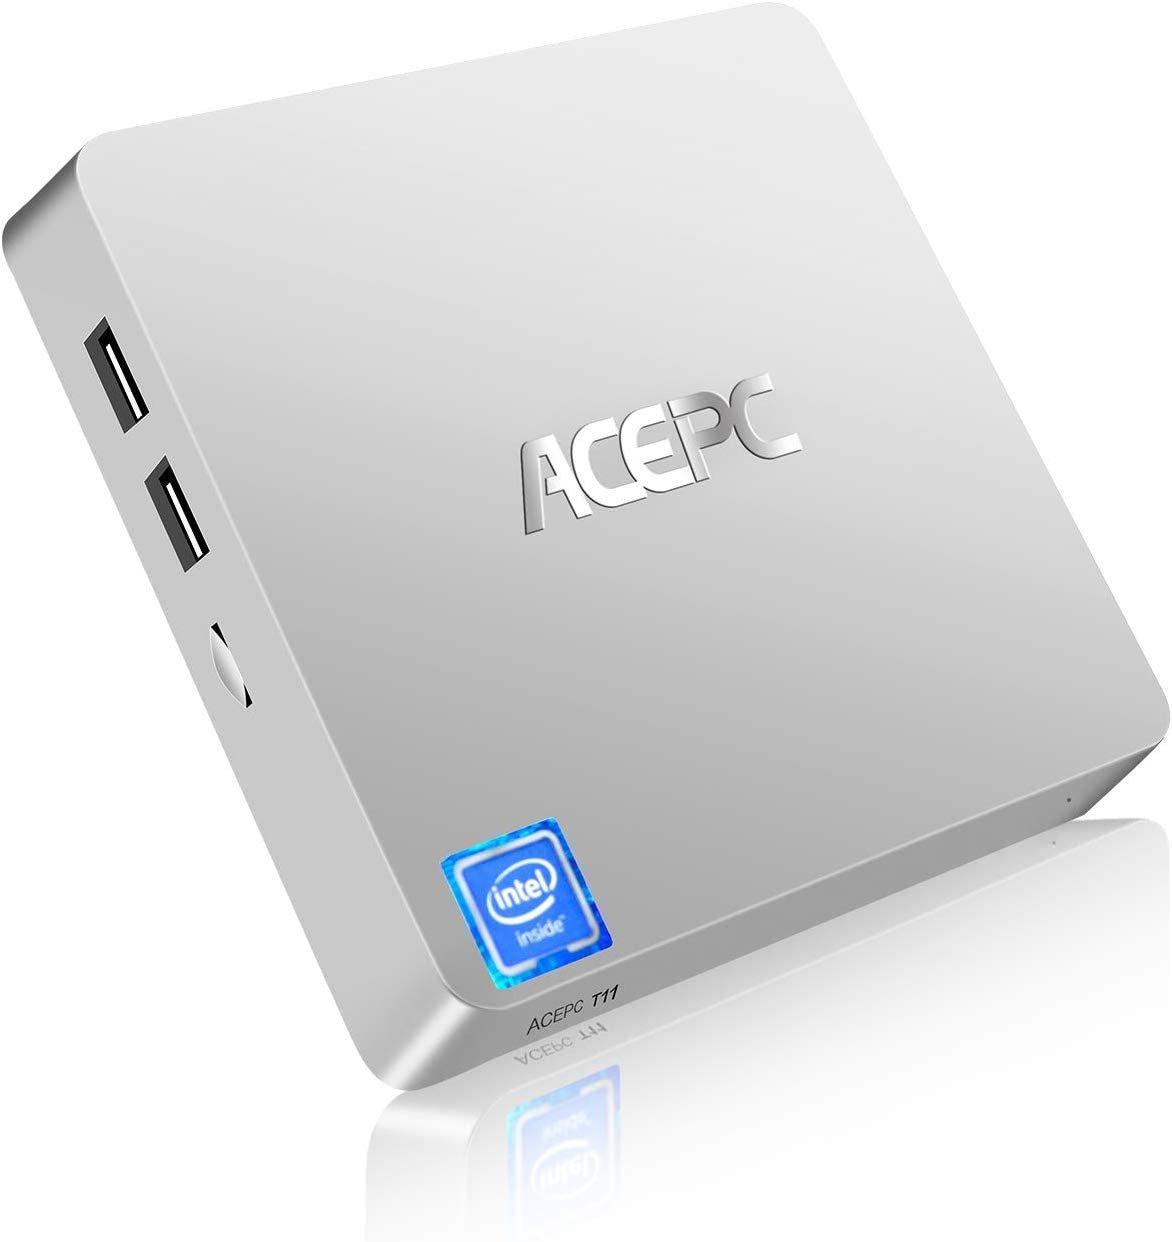 Mini PC, ACEPC T11 Windows 10 Pro(64 bits) Intel x5-z8350,sin Ventilador,con Terminal HDMI/VGA, Alta resolución 4K, 4GB/64GB eMMc,2.4/5G WiFi,Gigabit Ethernet,Soporte 2.5 Pulgadas Sata SSD/HDD …